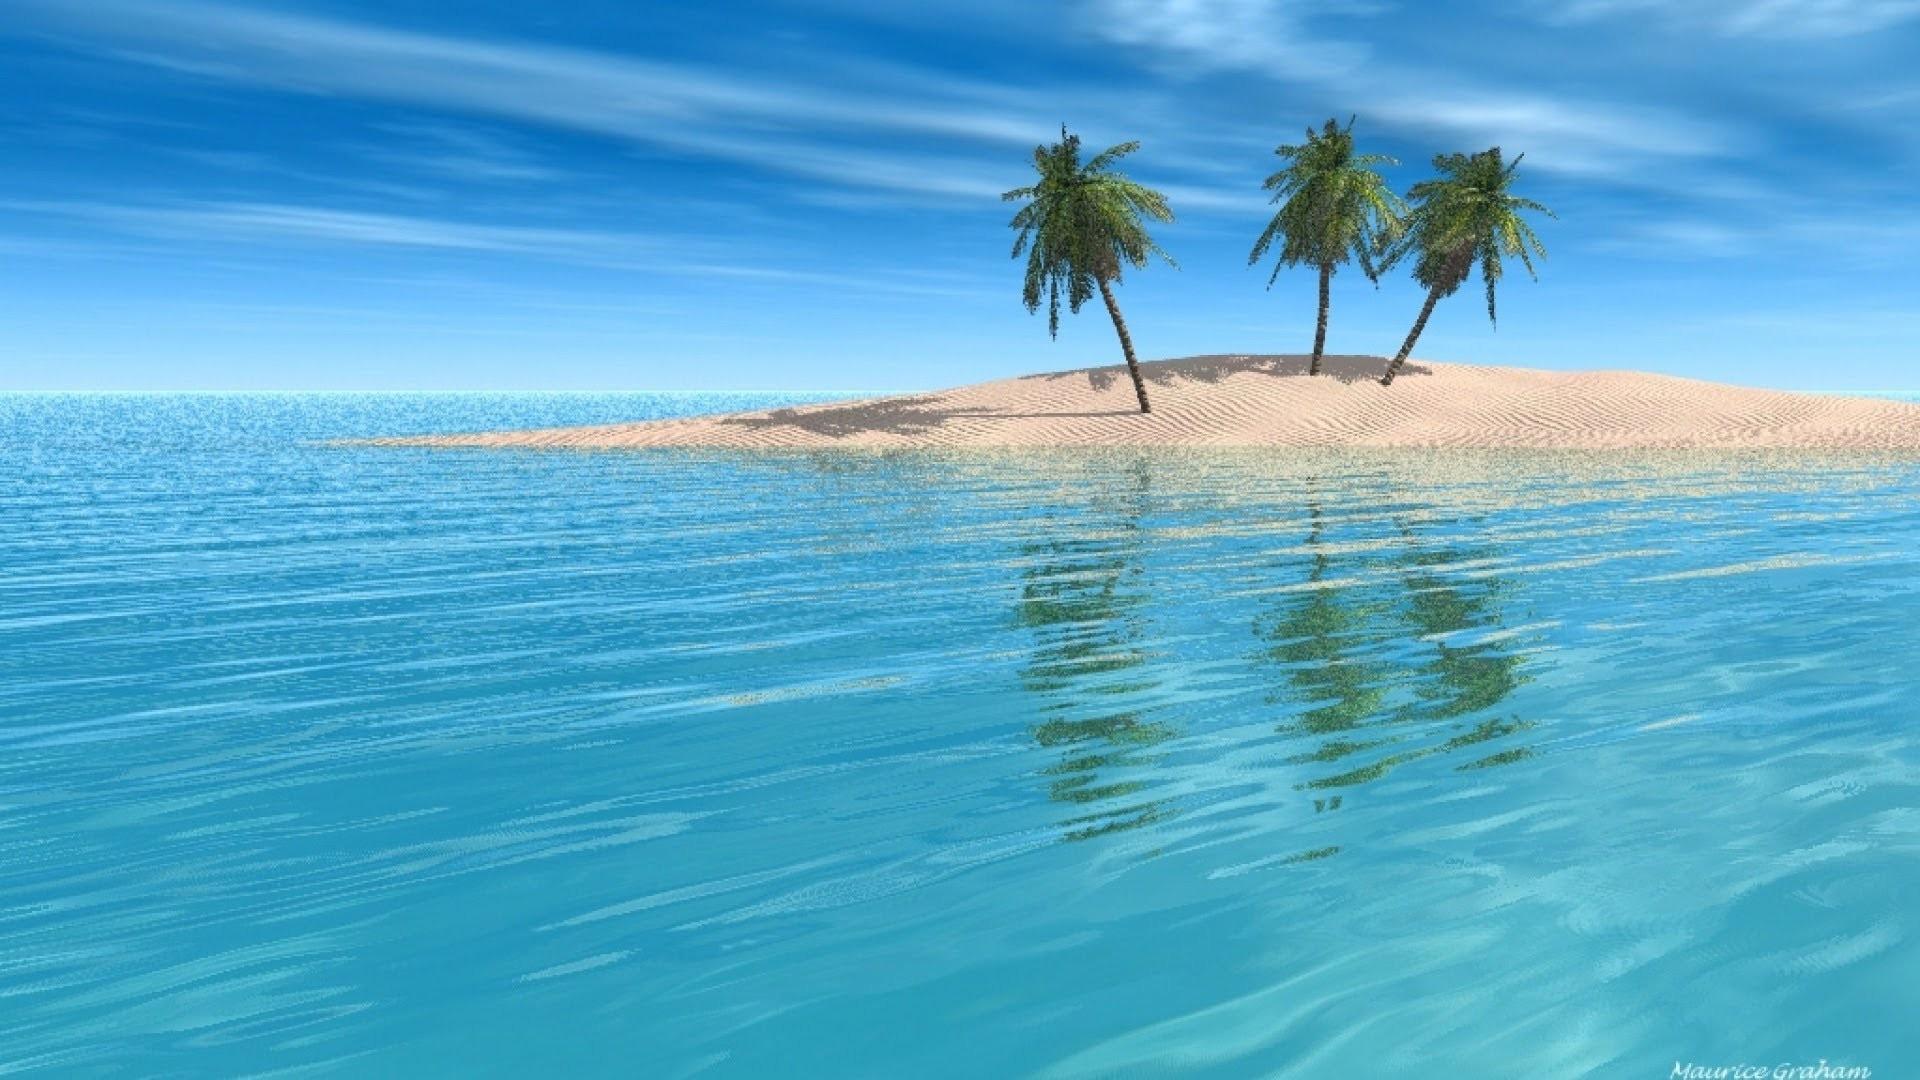 Hd Tropical Island Beach Paradise Wallpapers And Backgrounds: Tropical Island Background ·① WallpaperTag